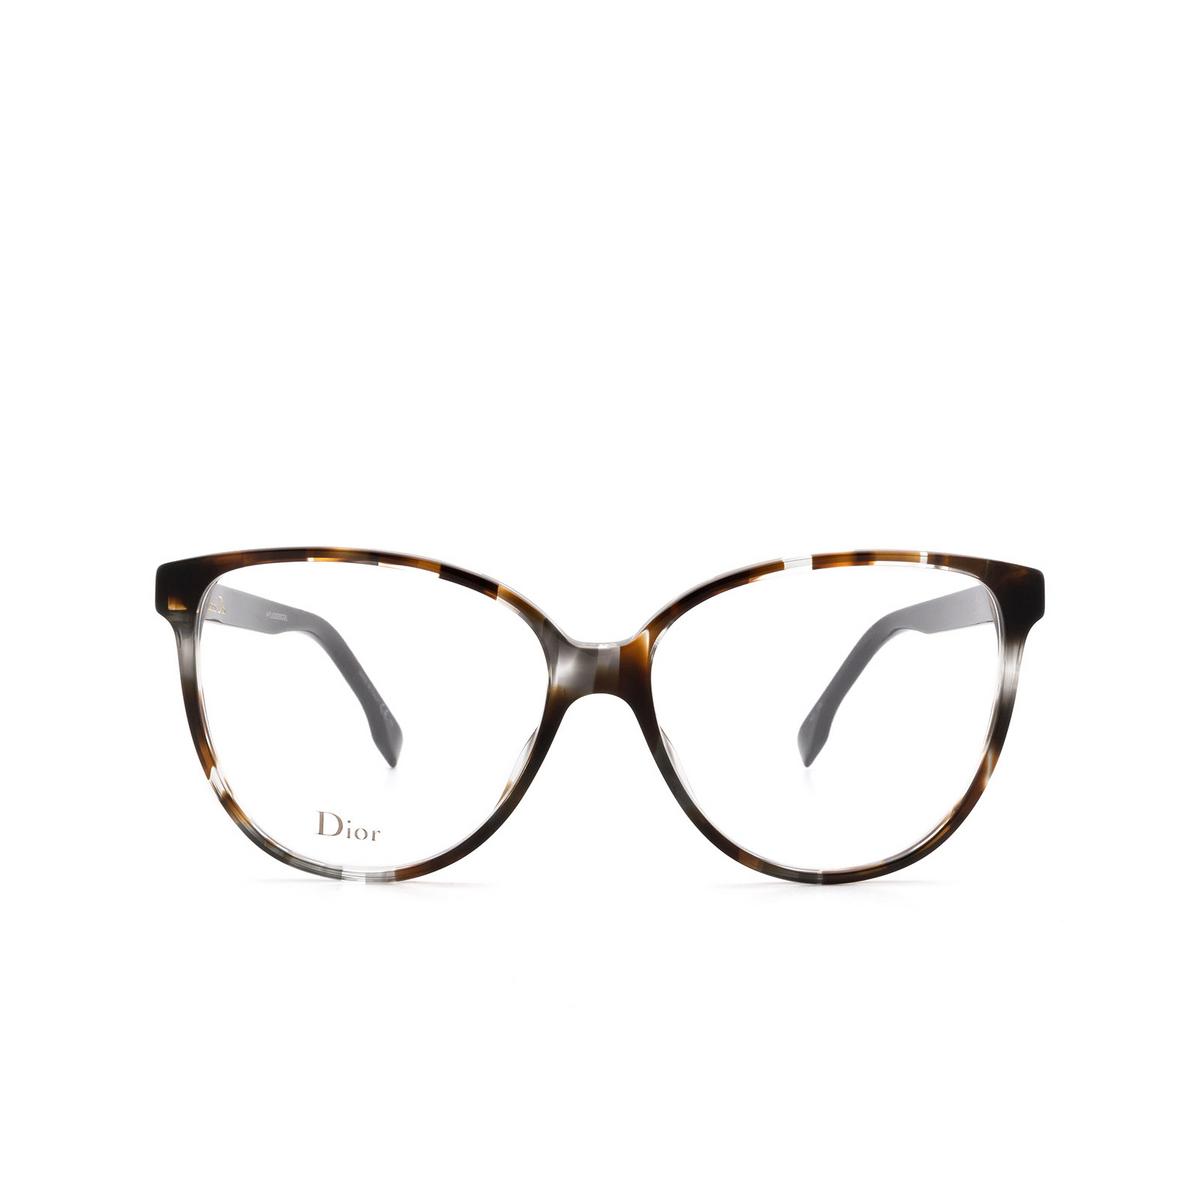 Dior® Butterfly Eyeglasses: DIORETOILE3 color Grey Havana Aci - front view.